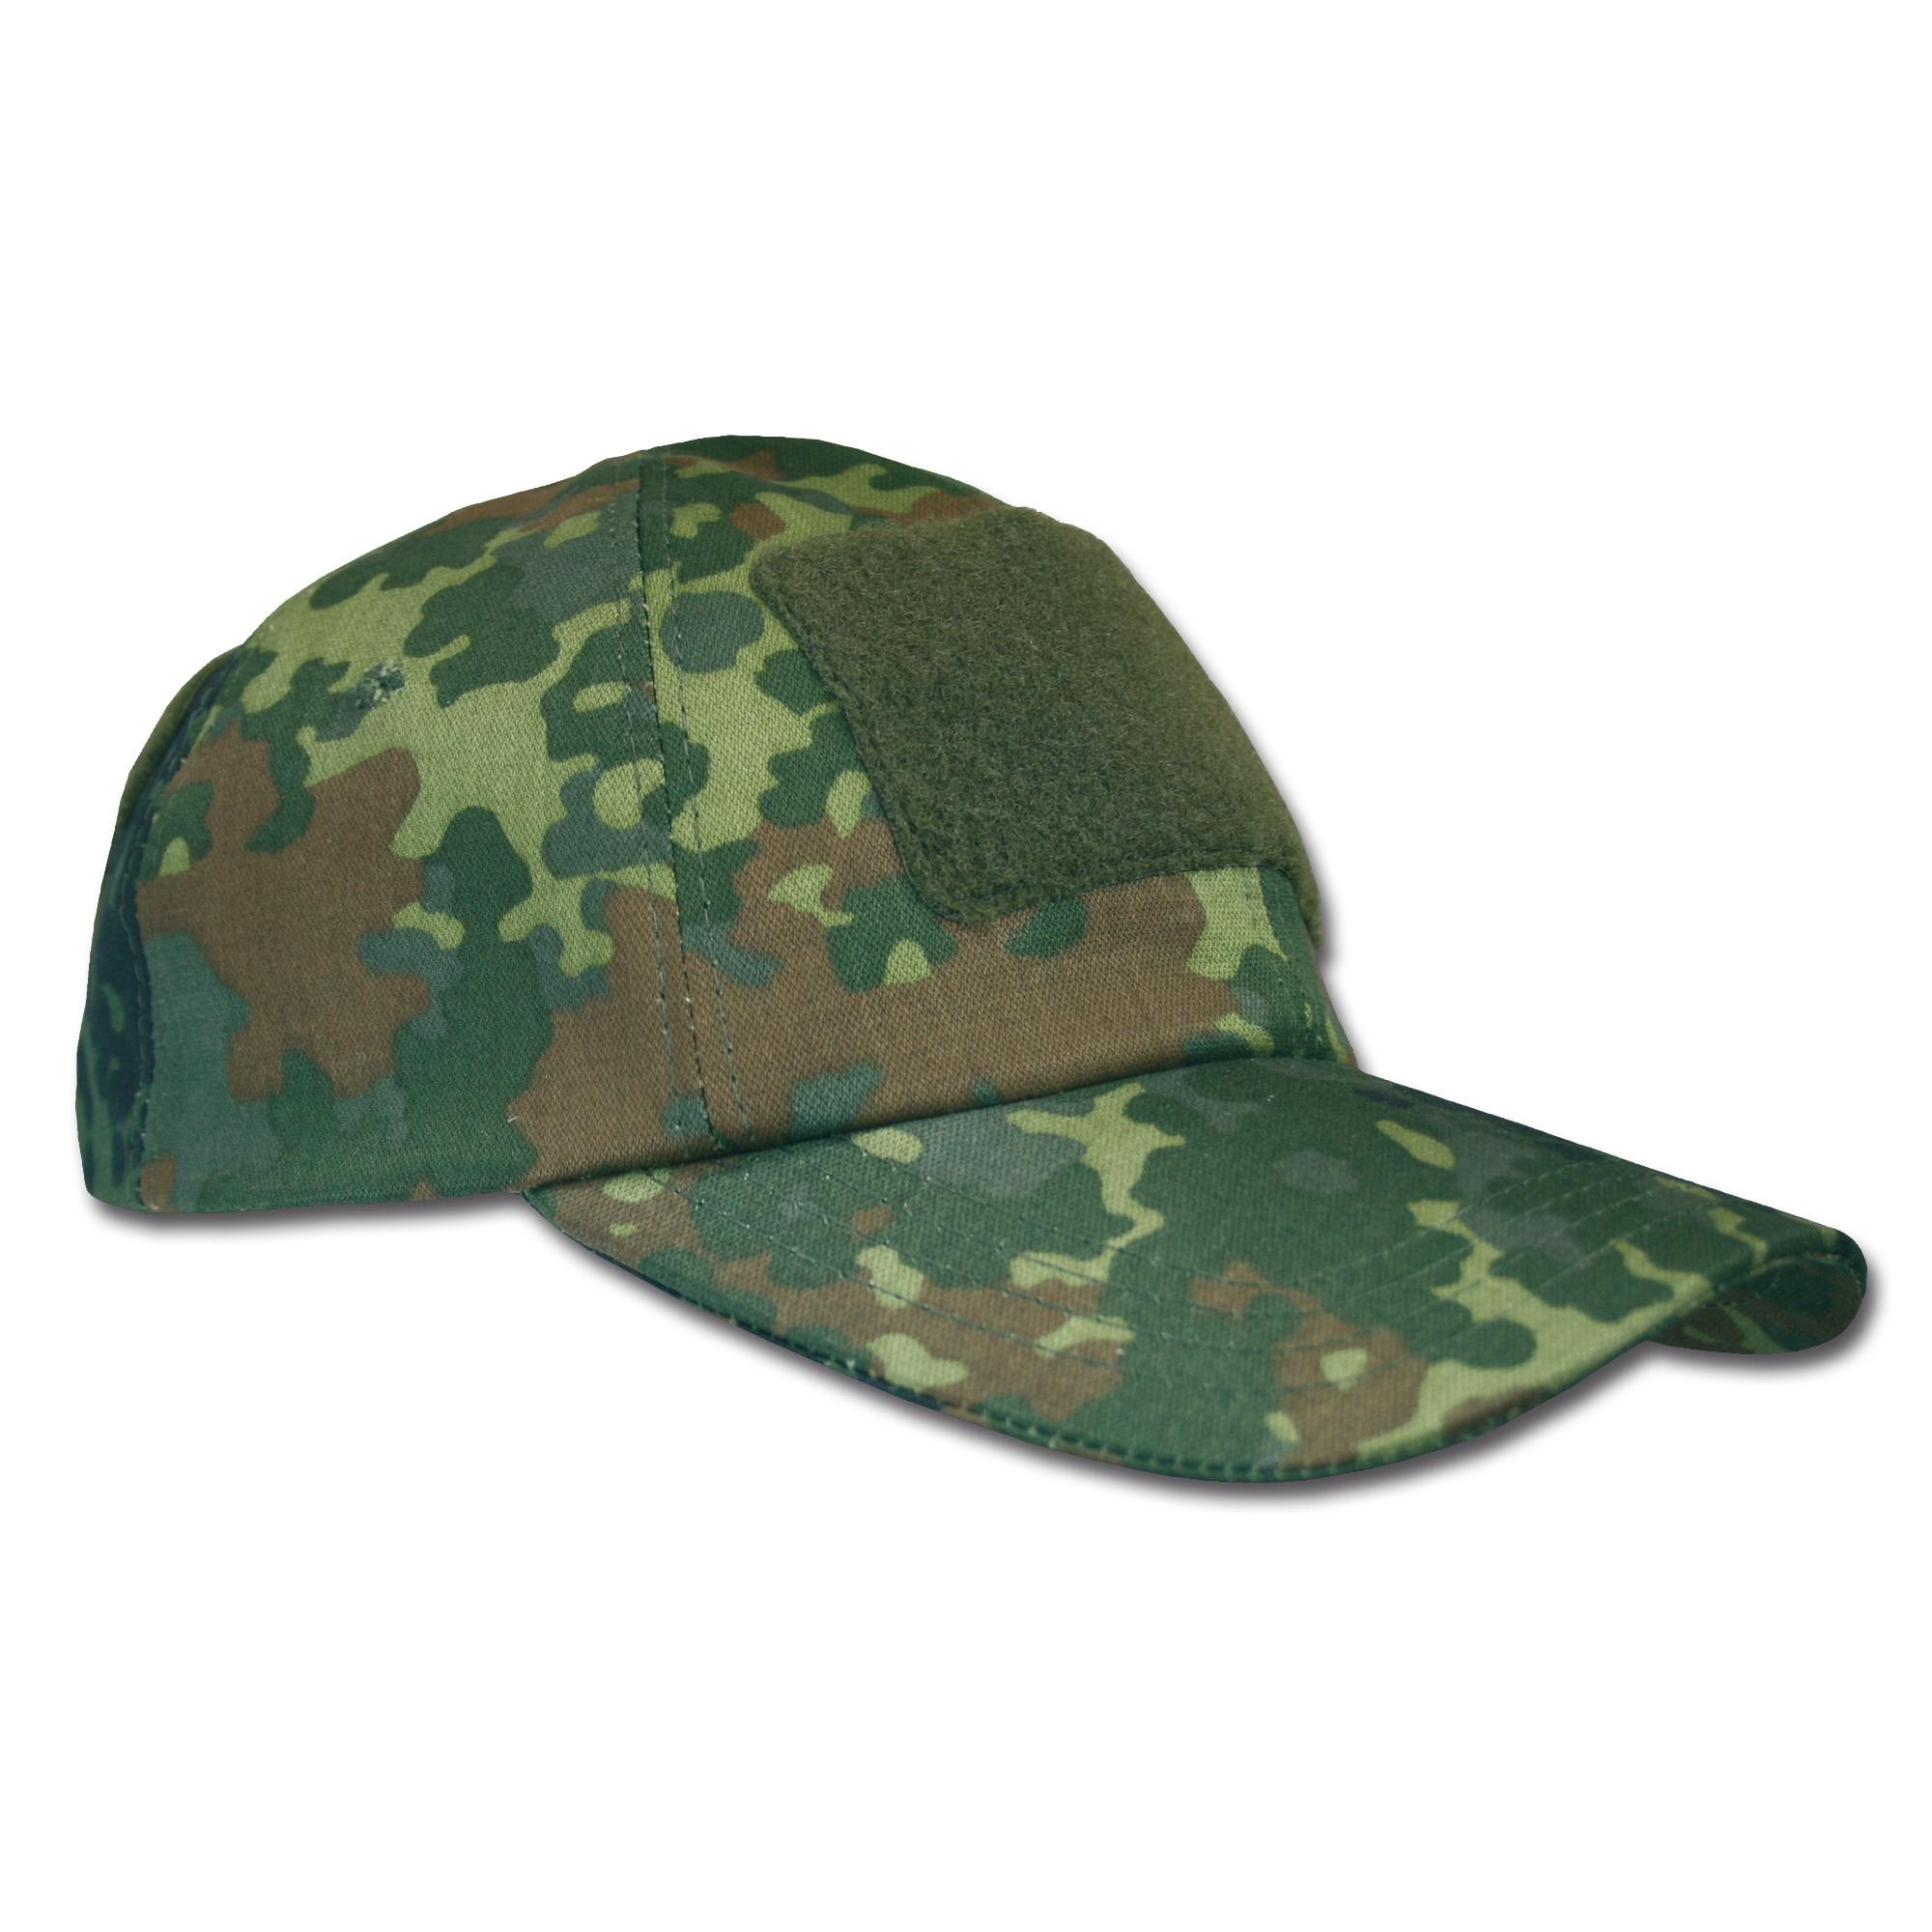 Baseballcap flecktarn Tactical